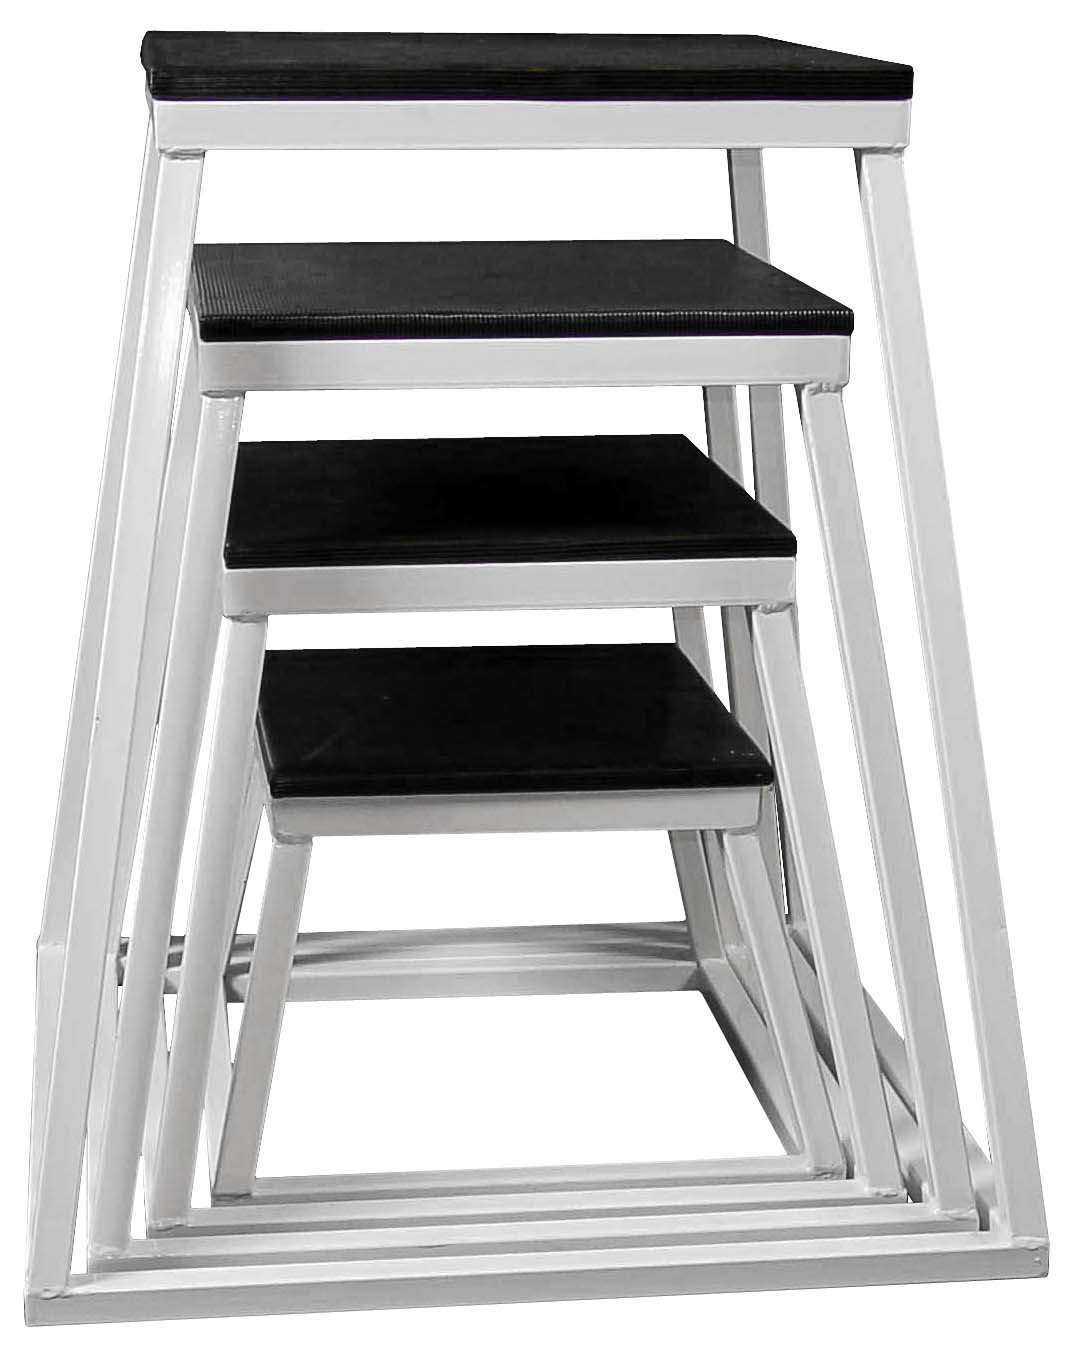 Ader Plyometric Platform Box Set- 12'', 18'', 24'', 30'' White